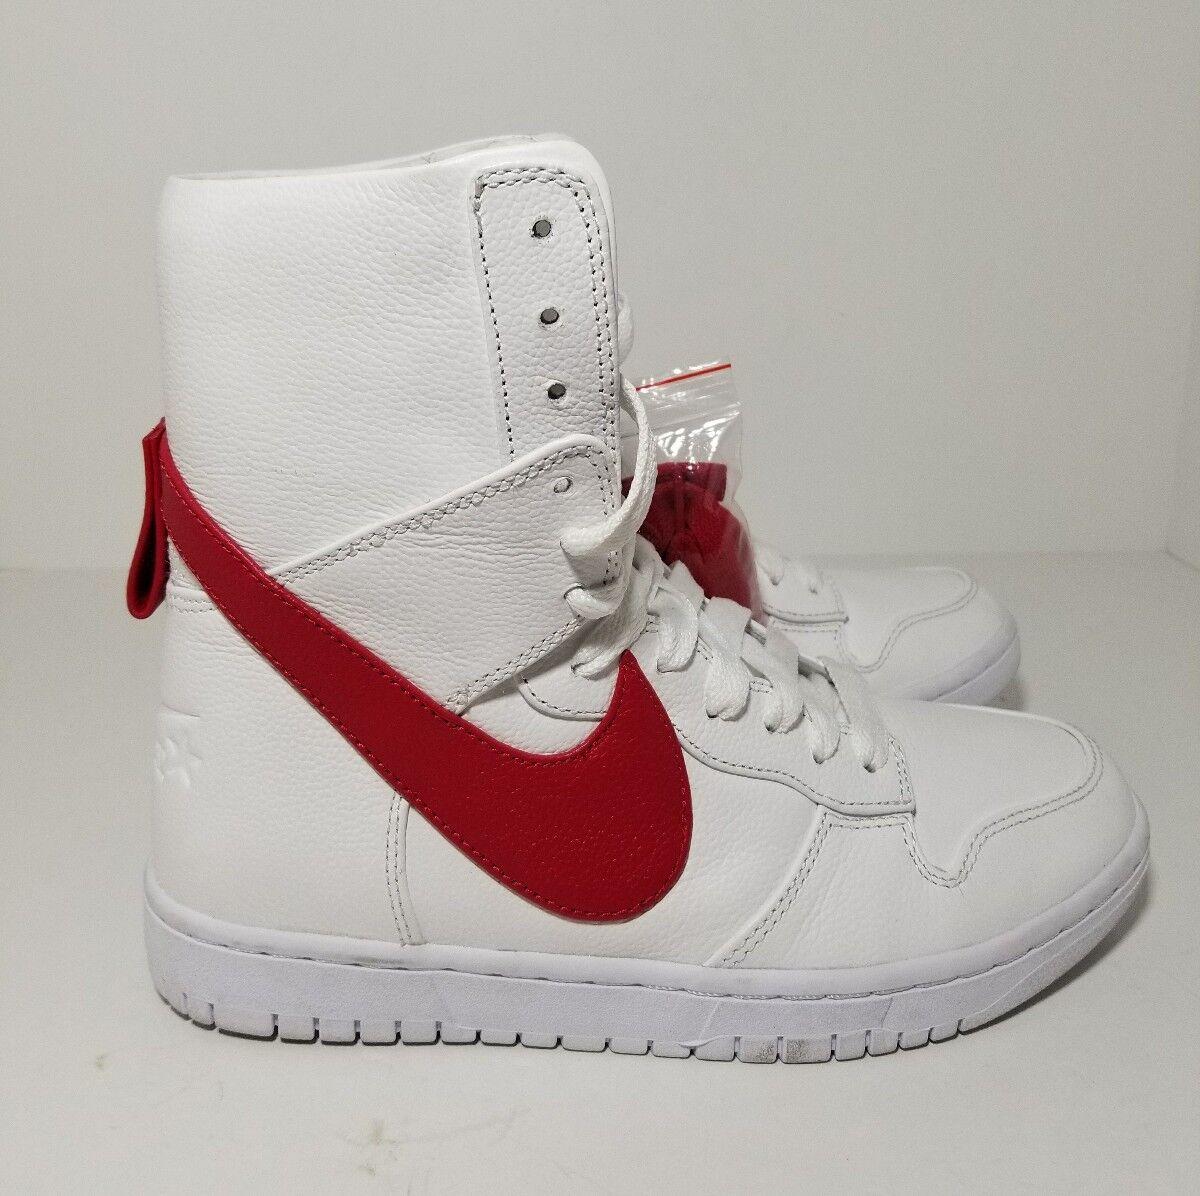 Riccardo Tisci Nike Lab Dunk Lux High White Red 841647-160 Men's Size 6.5